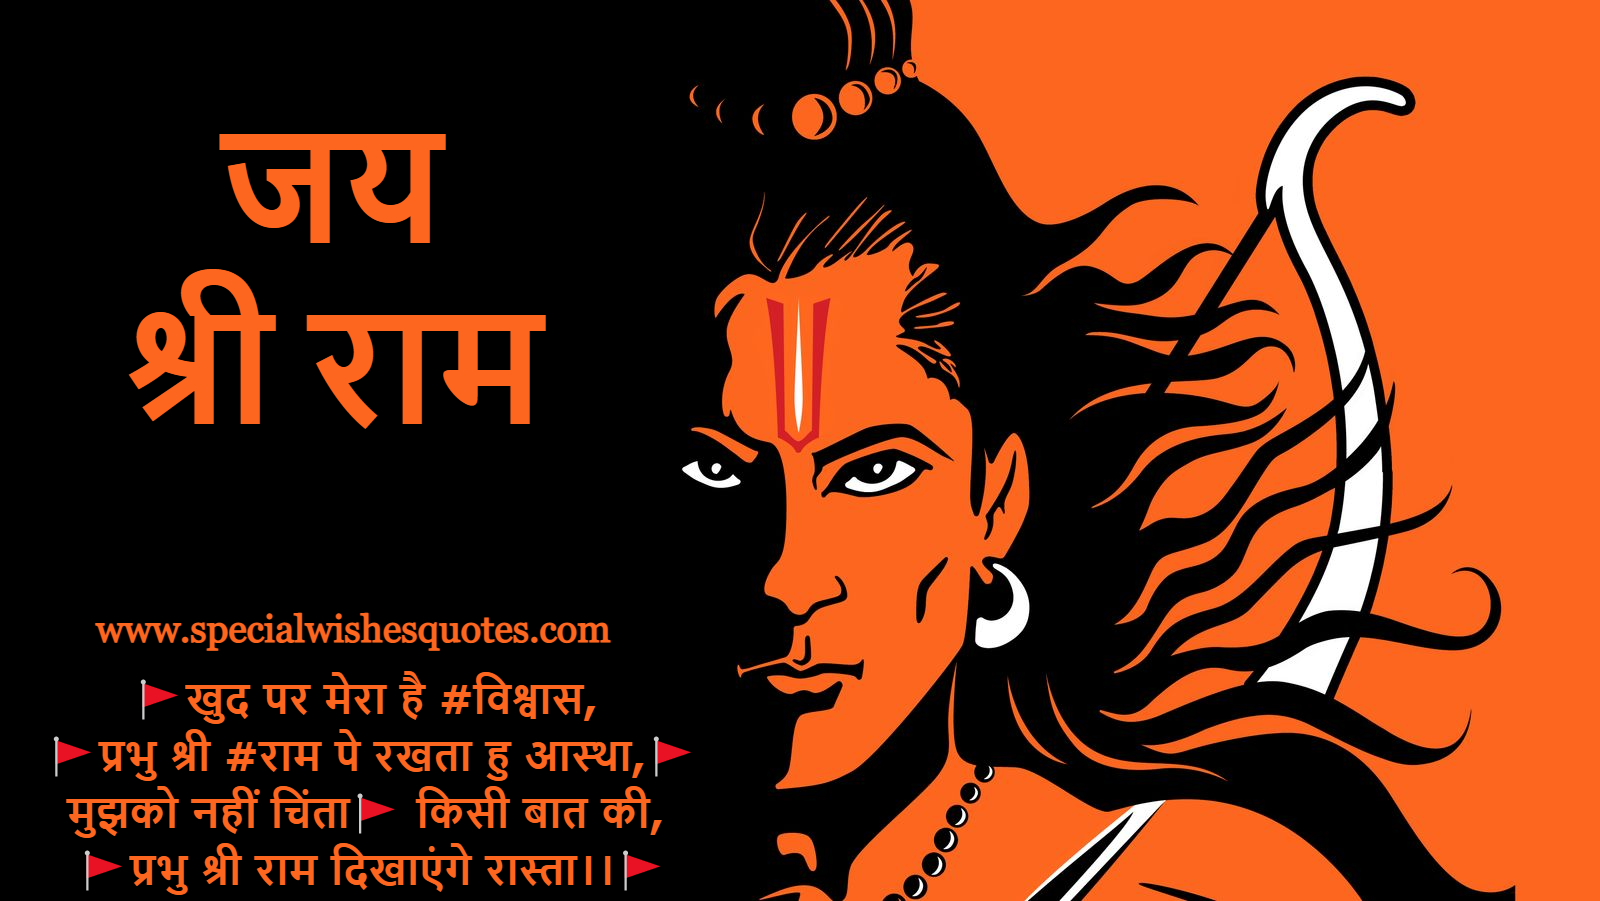 jai shri ram status in hindi